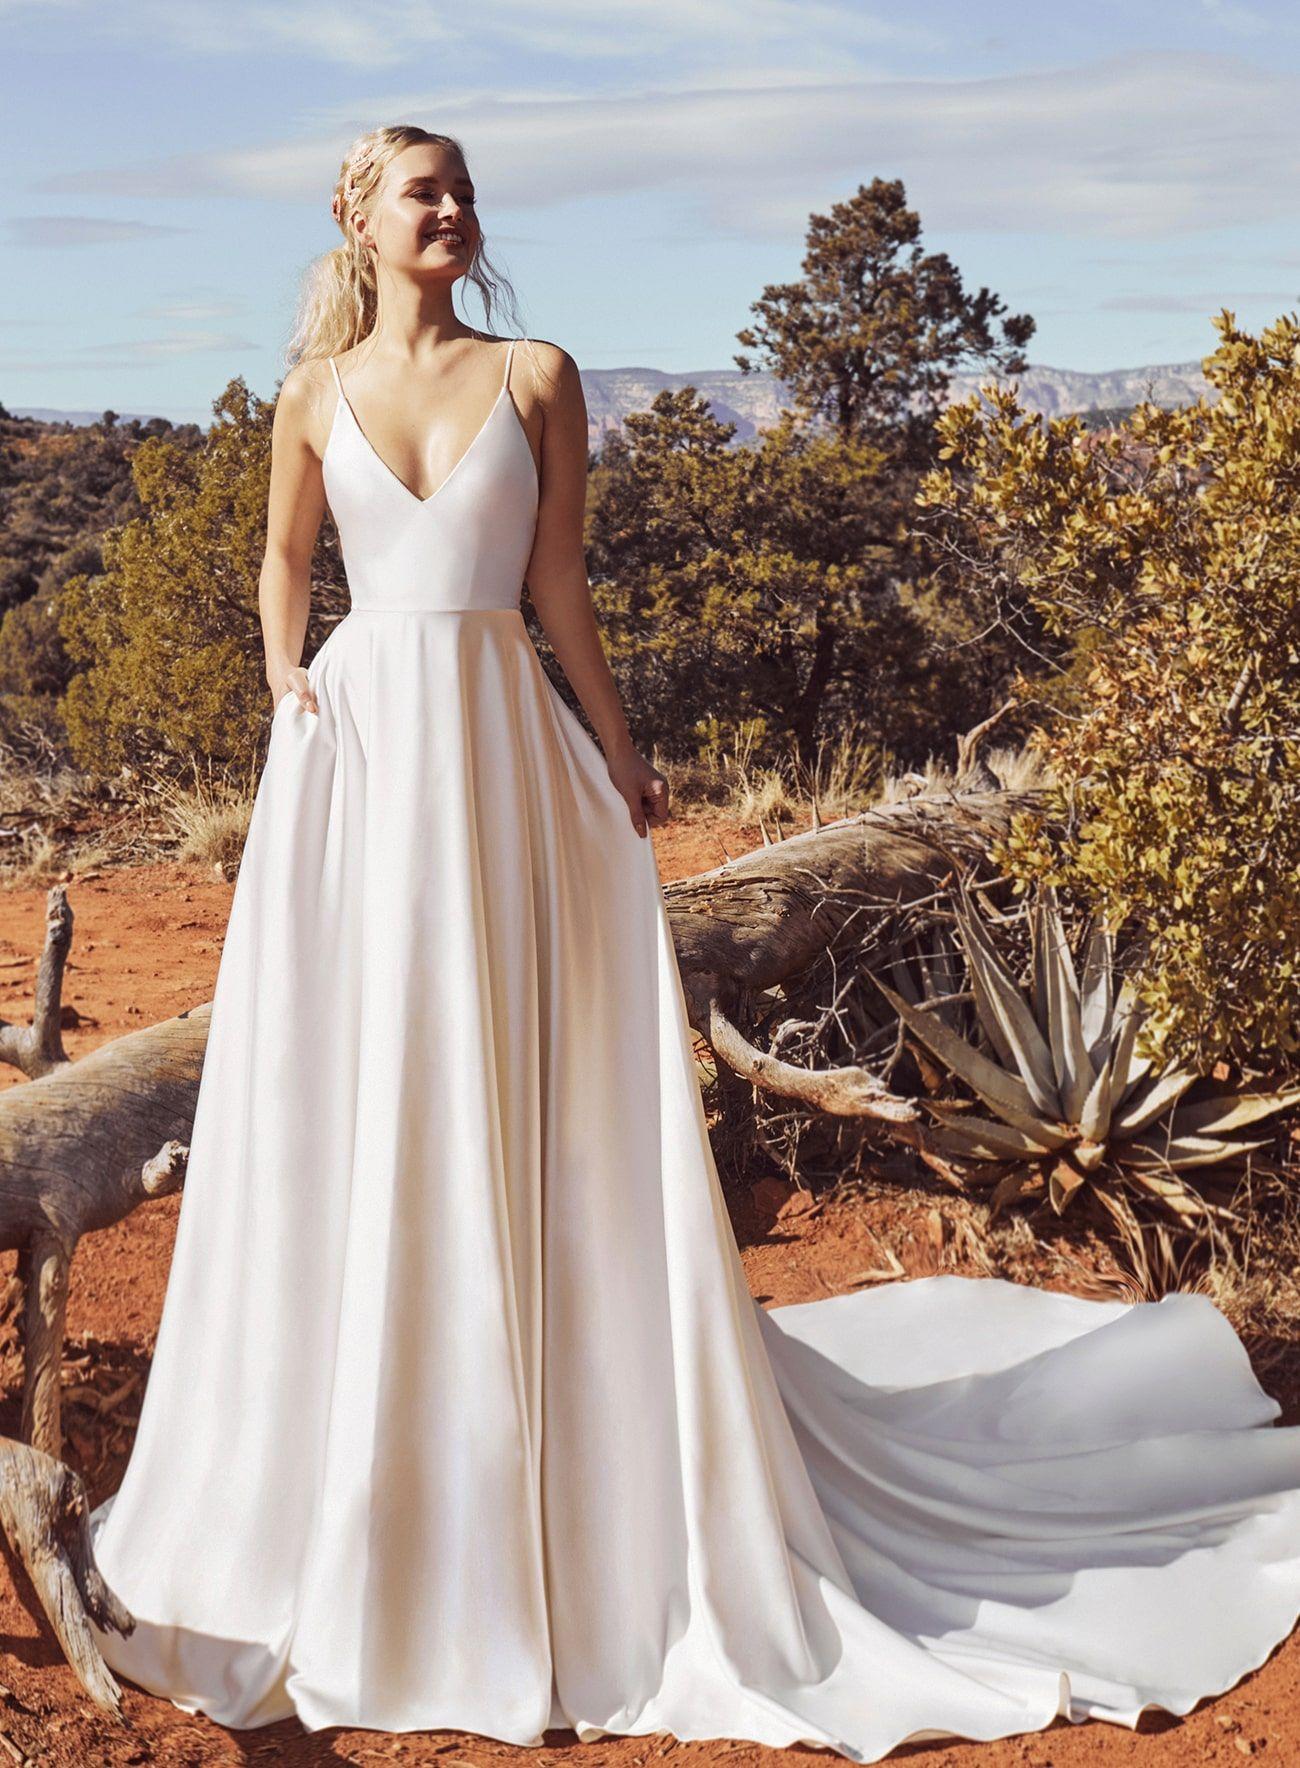 10 Simple Satin Wedding Dresses For A Sophisticated Celebration Wedding Dress Organza Beach Wedding Dress Boho Wedding Dresses Satin [ 1024 x 768 Pixel ]